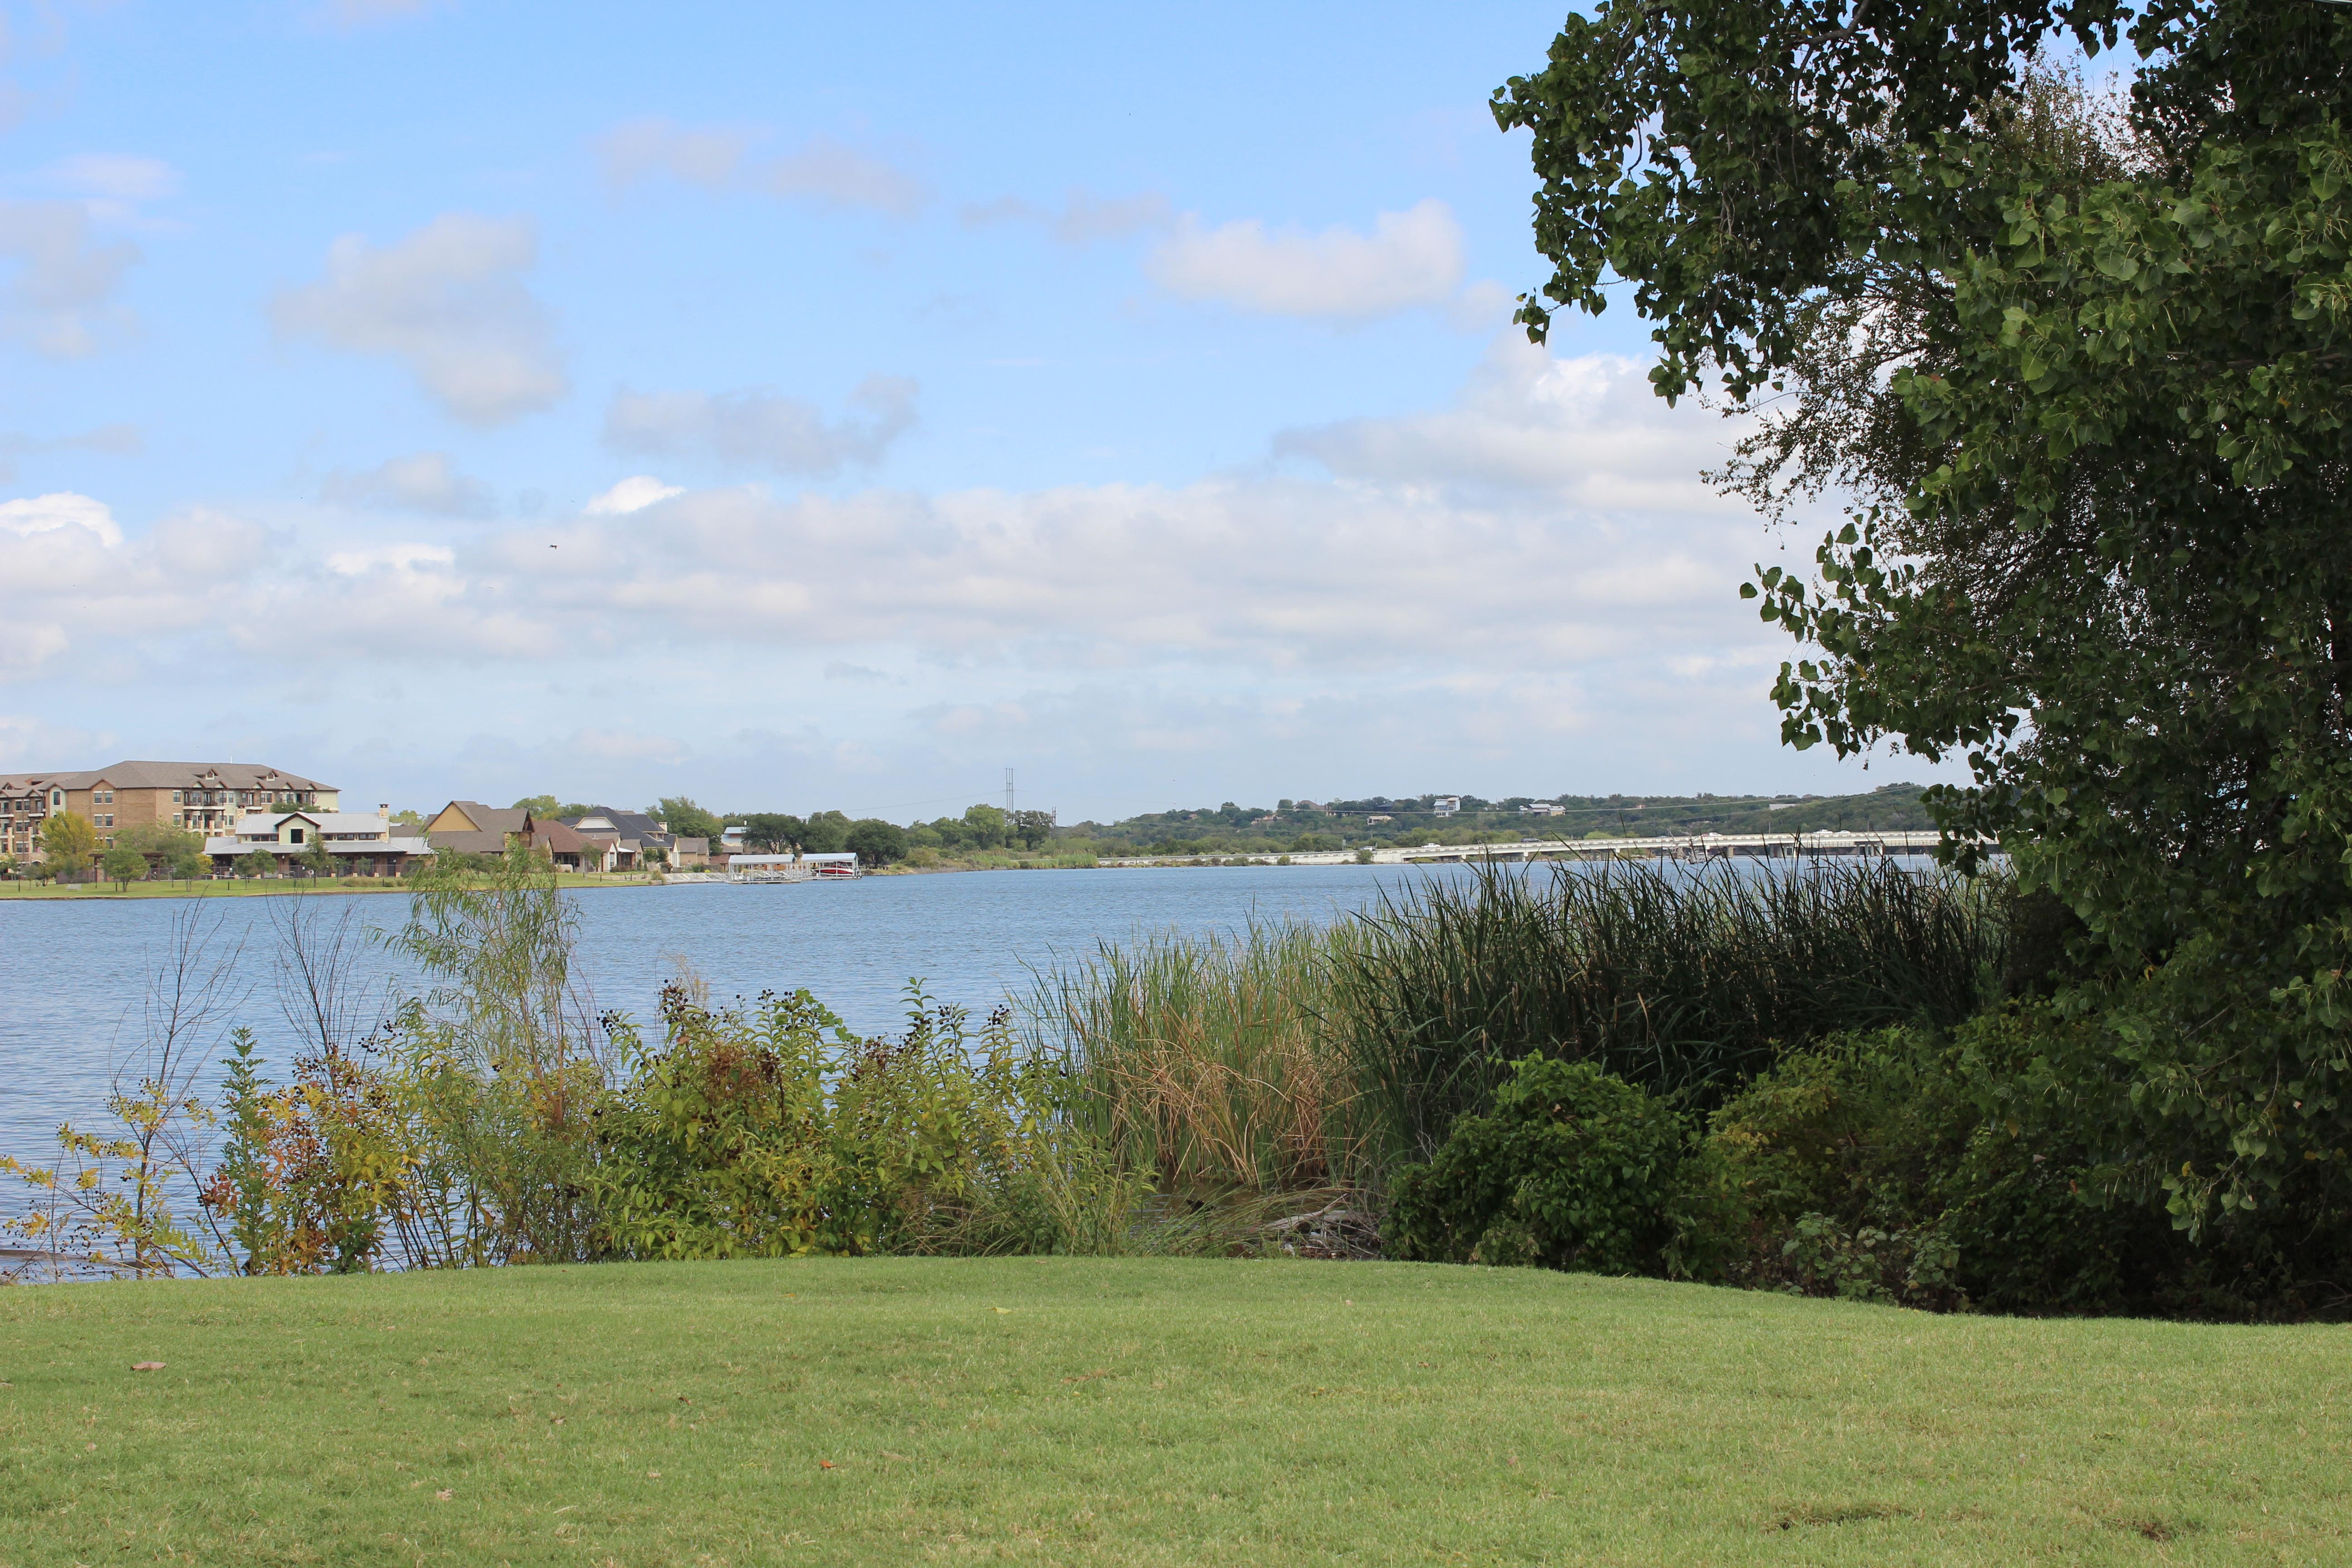 lakeshore-furthest-east-side-of-lakeshore